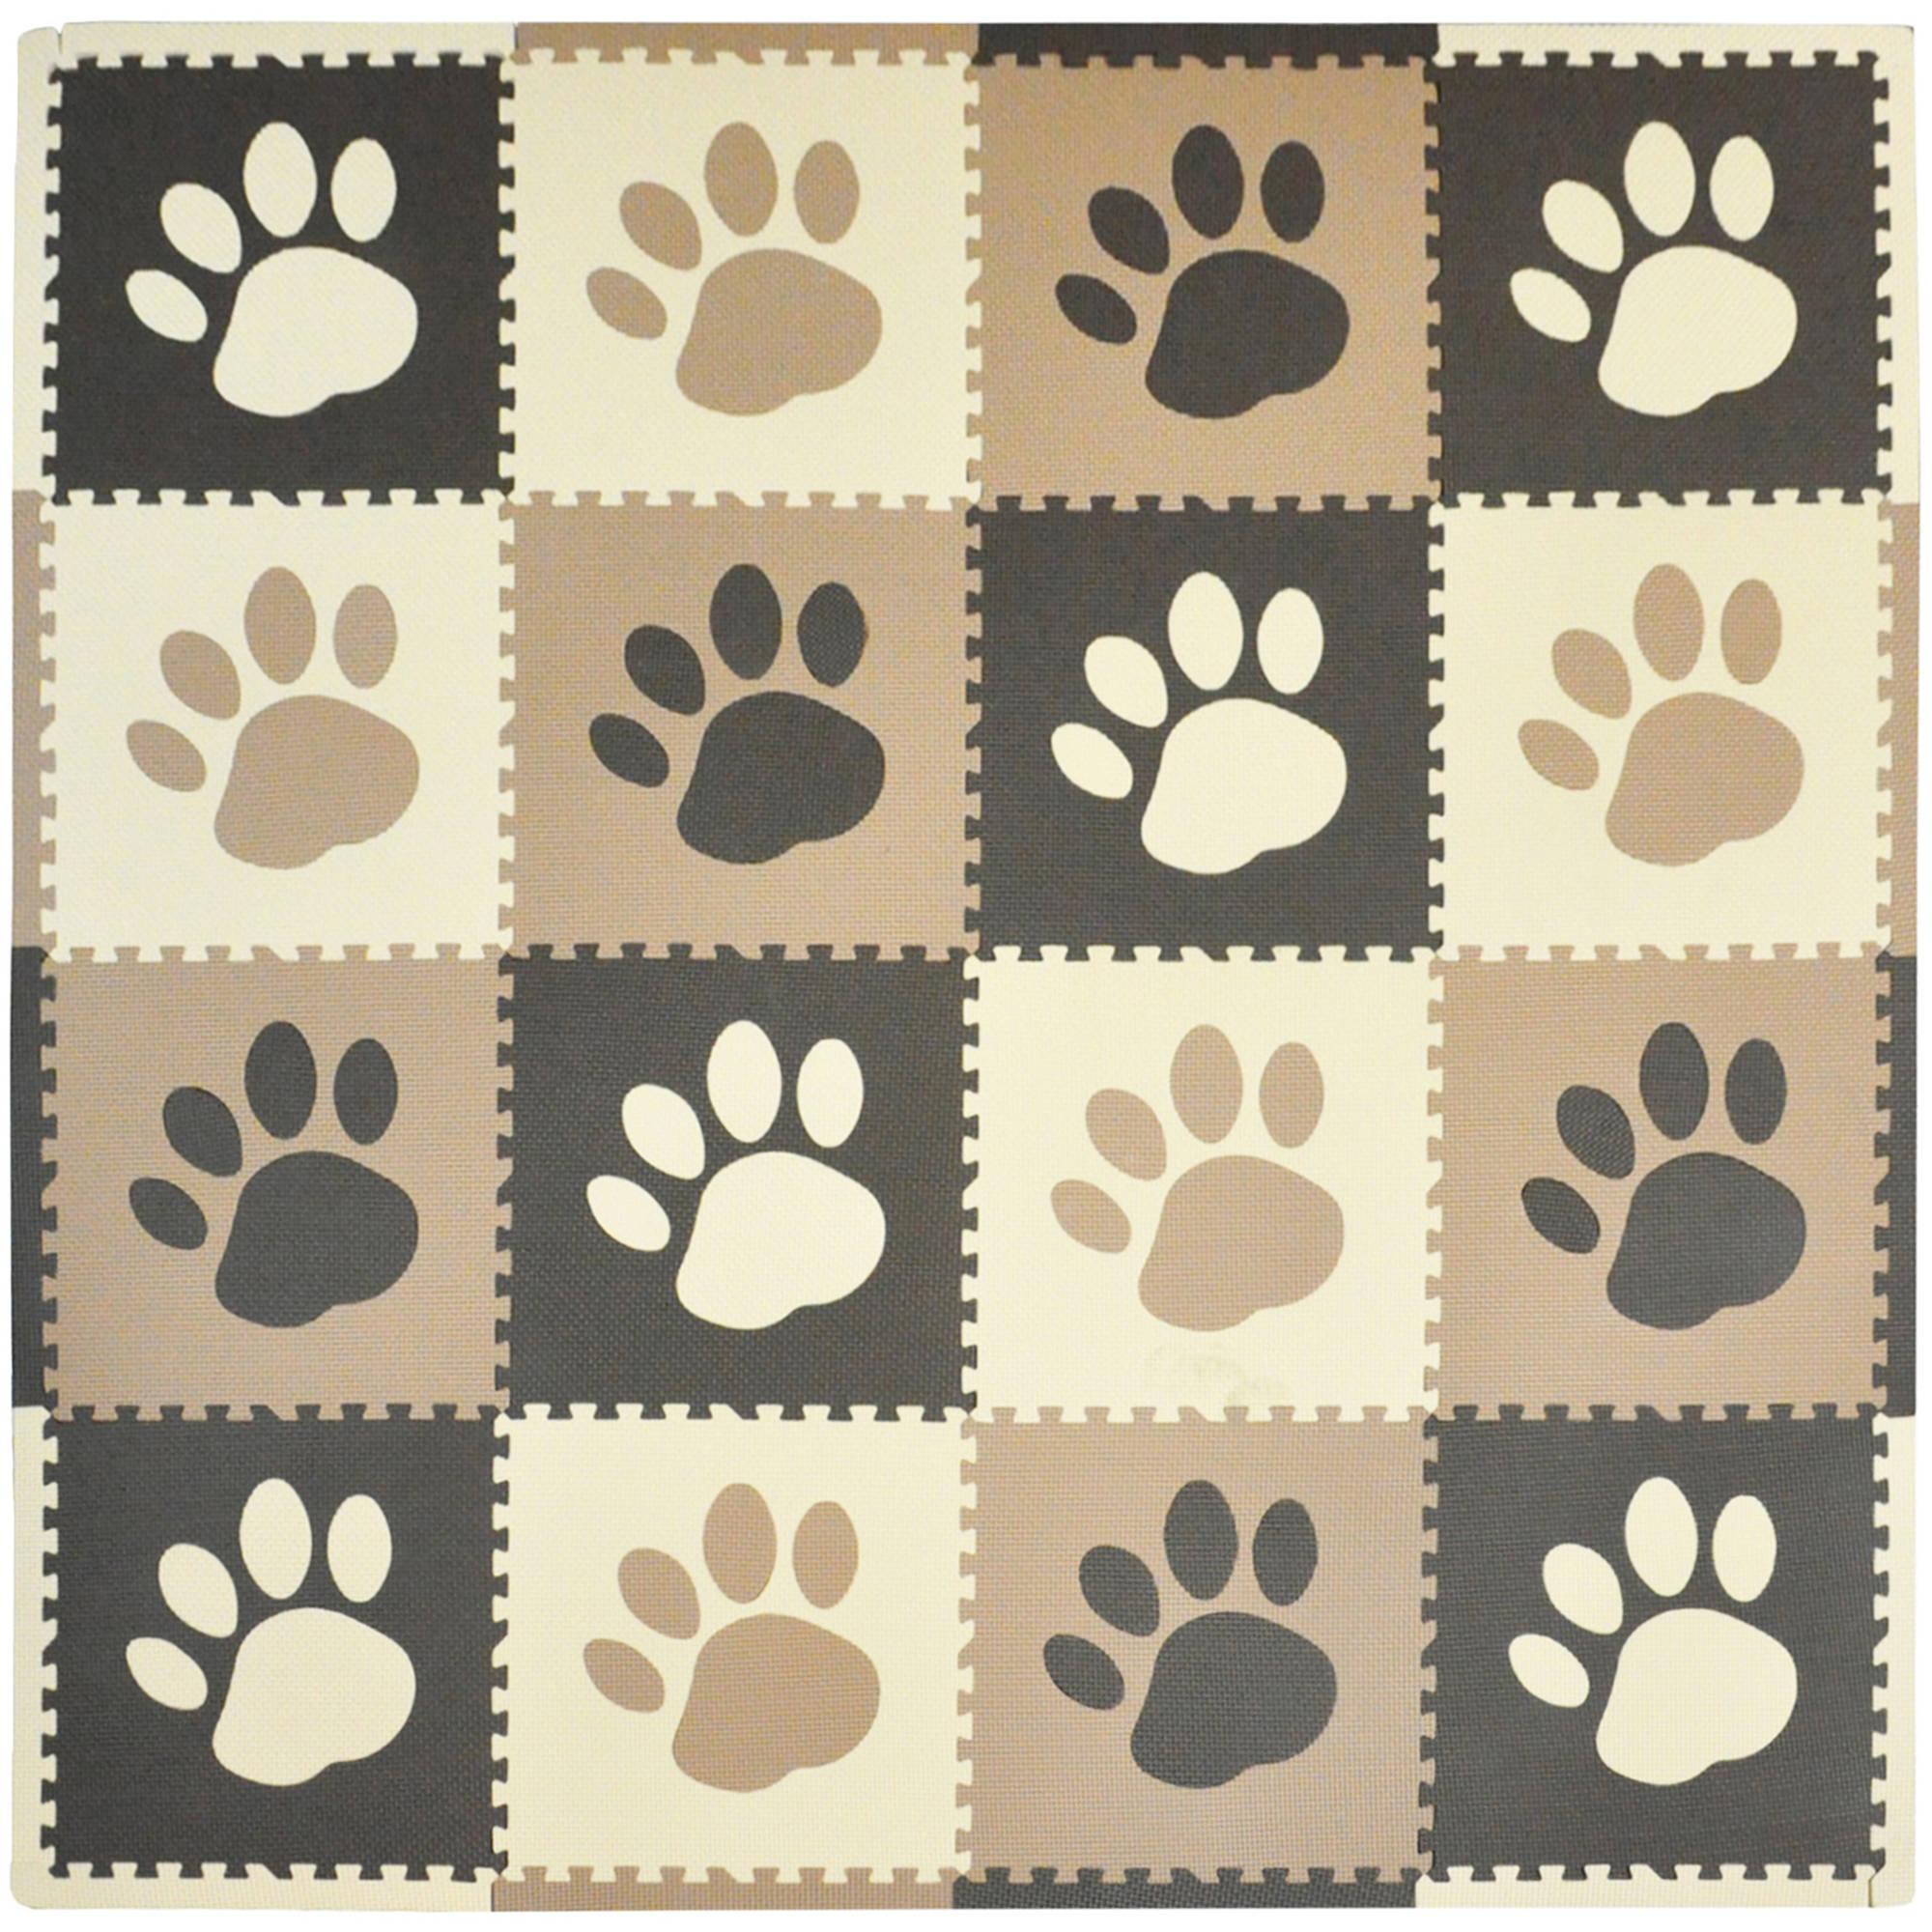 Tadpoles Playmat Set, 16pc, Pawprint, Brown